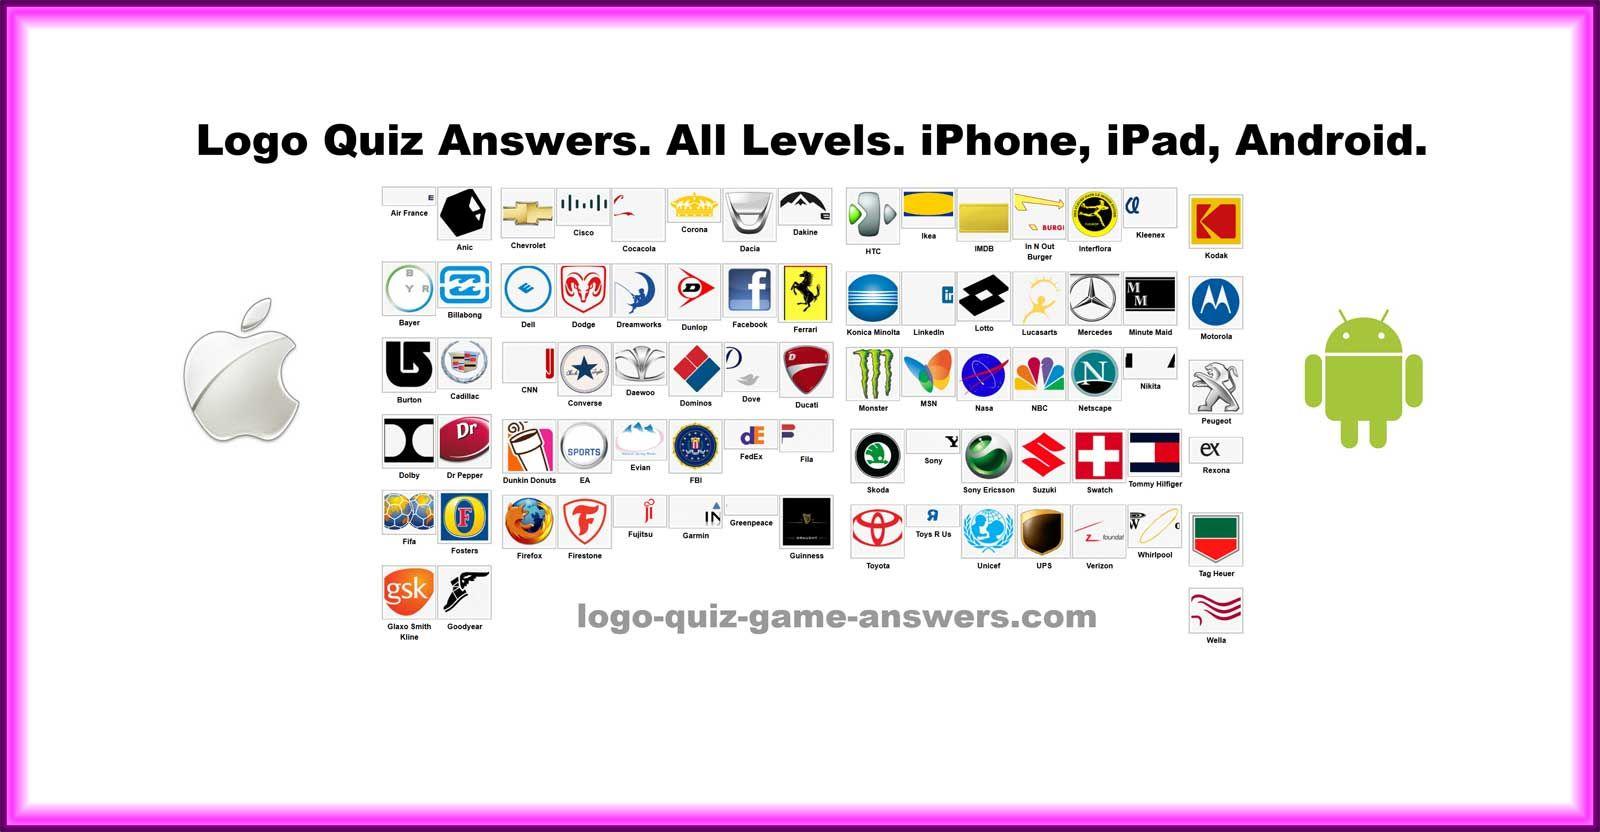 Iphone wallpaper quiz - Logo Quiz Answers Level 3 Hd Wallpapers Download Free Logo Quiz Answers Level 3 Tumblr